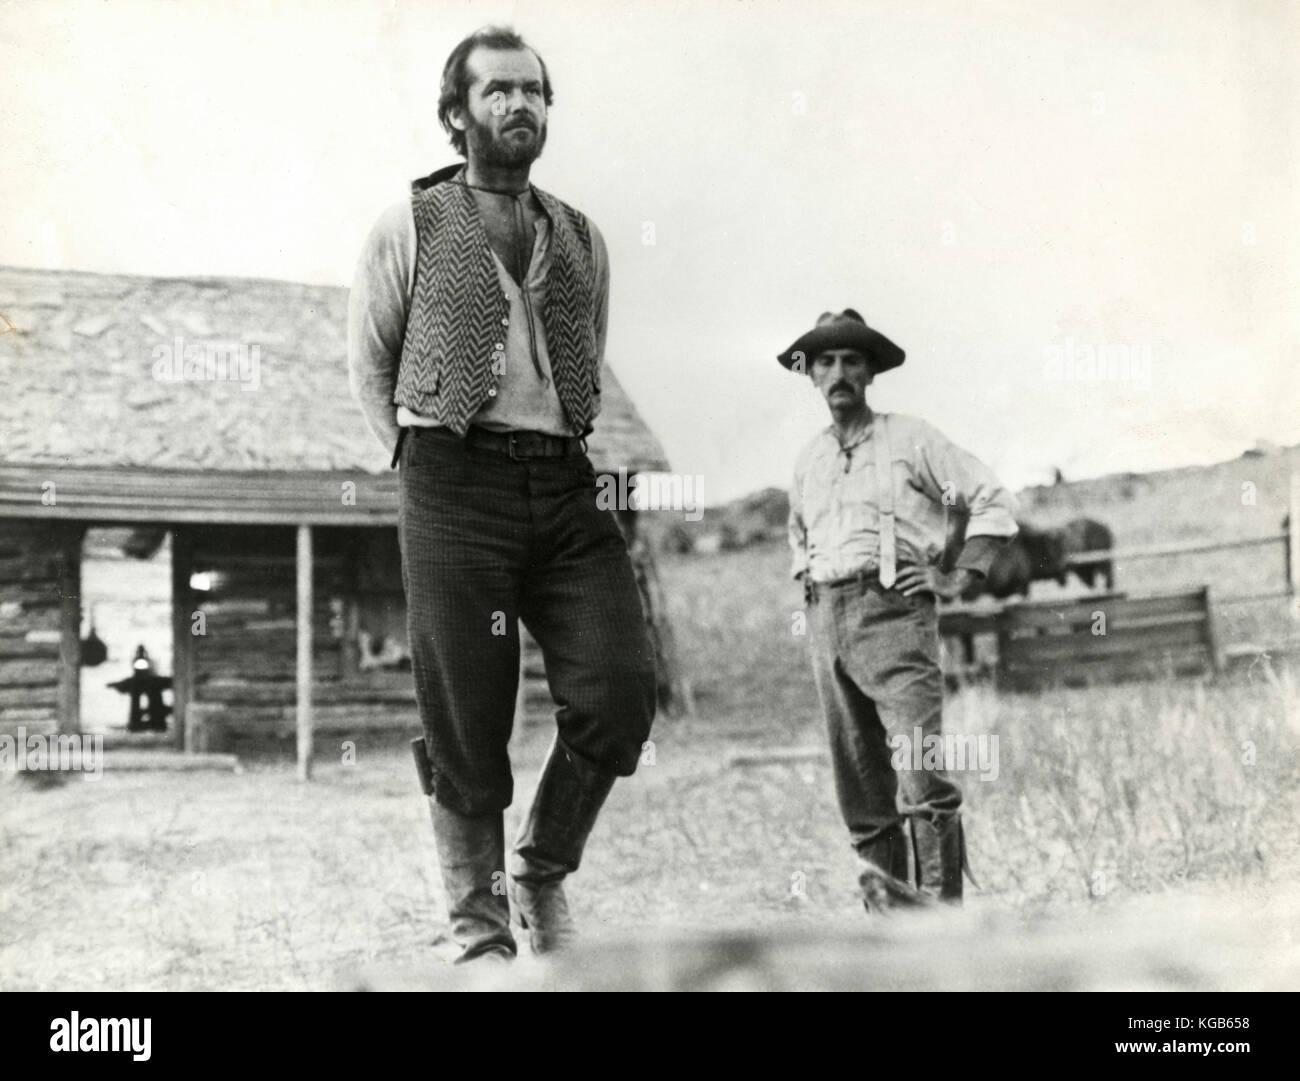 Actor Jack Nicholson in the movie Missouri Breaks, 1976 - Stock Image